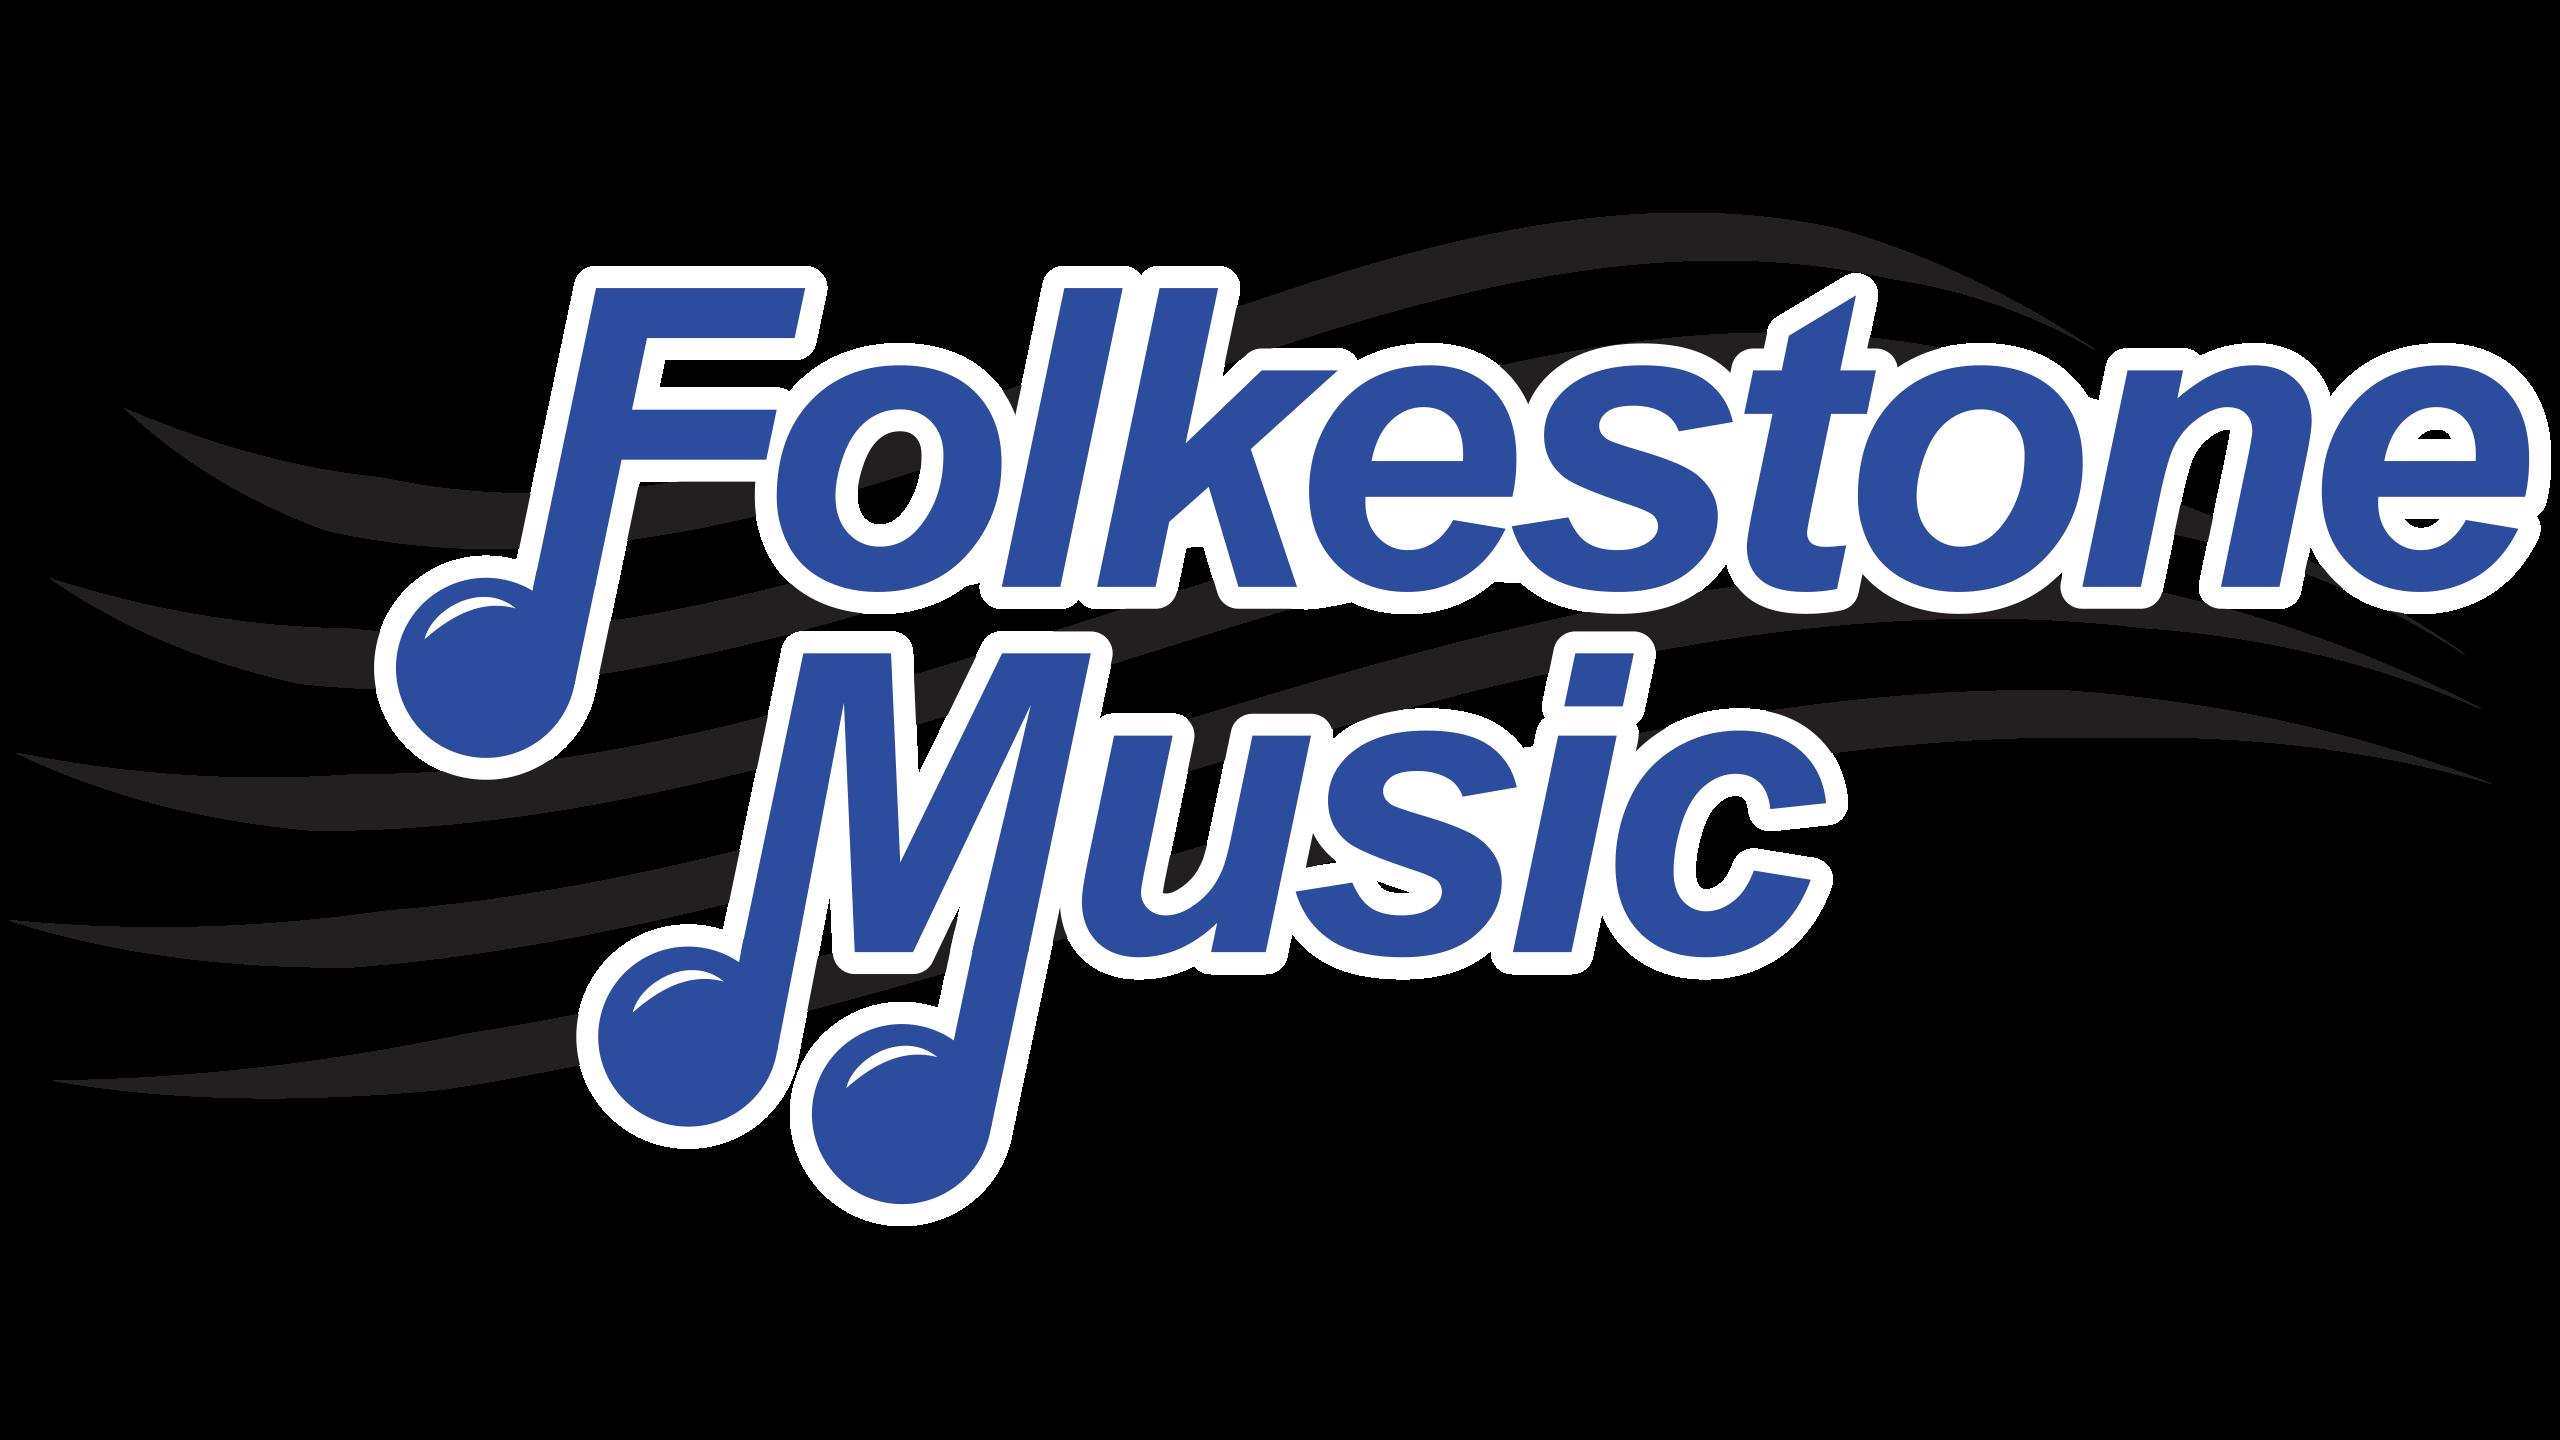 Folkestone Music